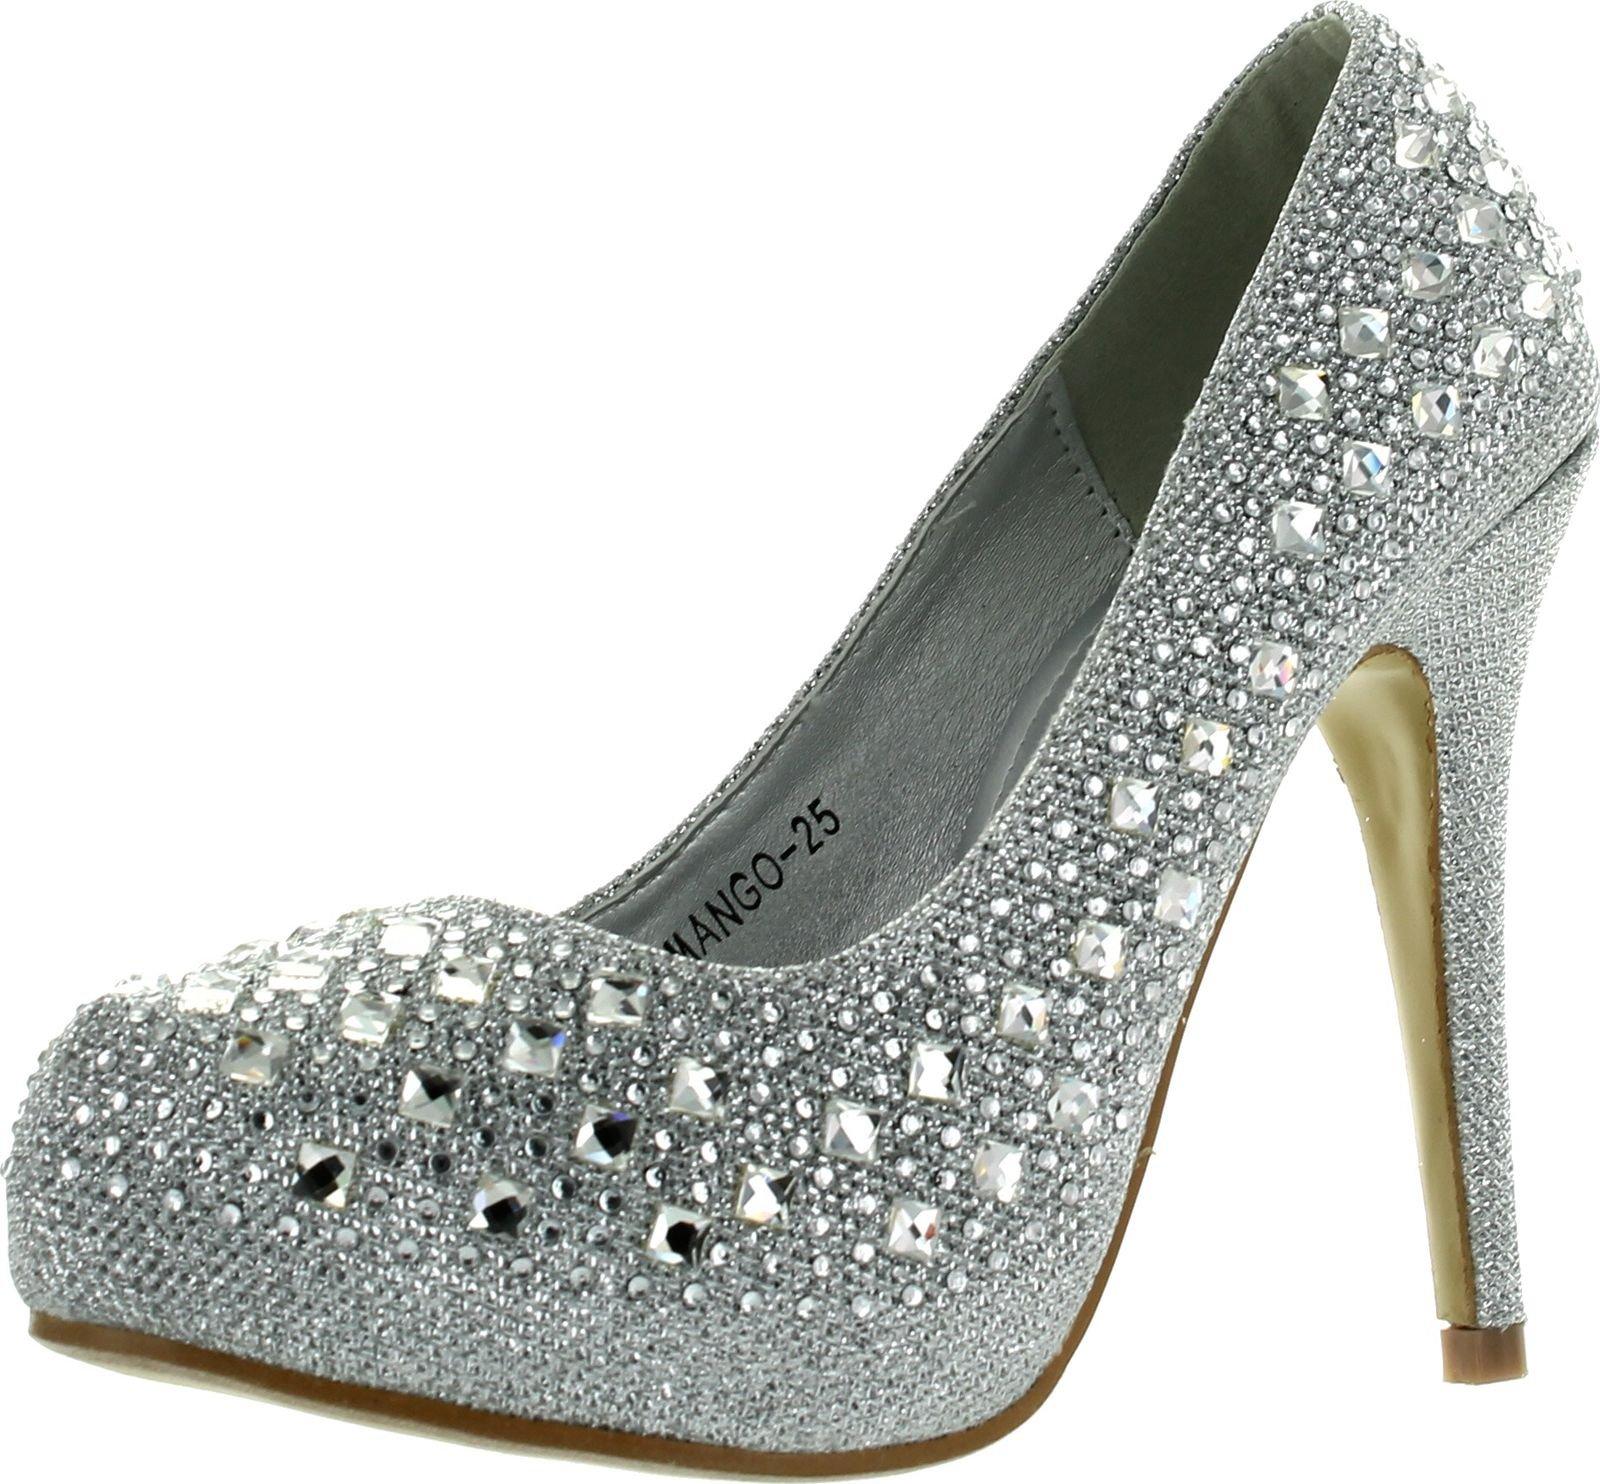 Top Moda Womens Mango-25 Rhinestone Studded Sparkling Platform Stiletto Heel Dress Pumps,Silver,5.5